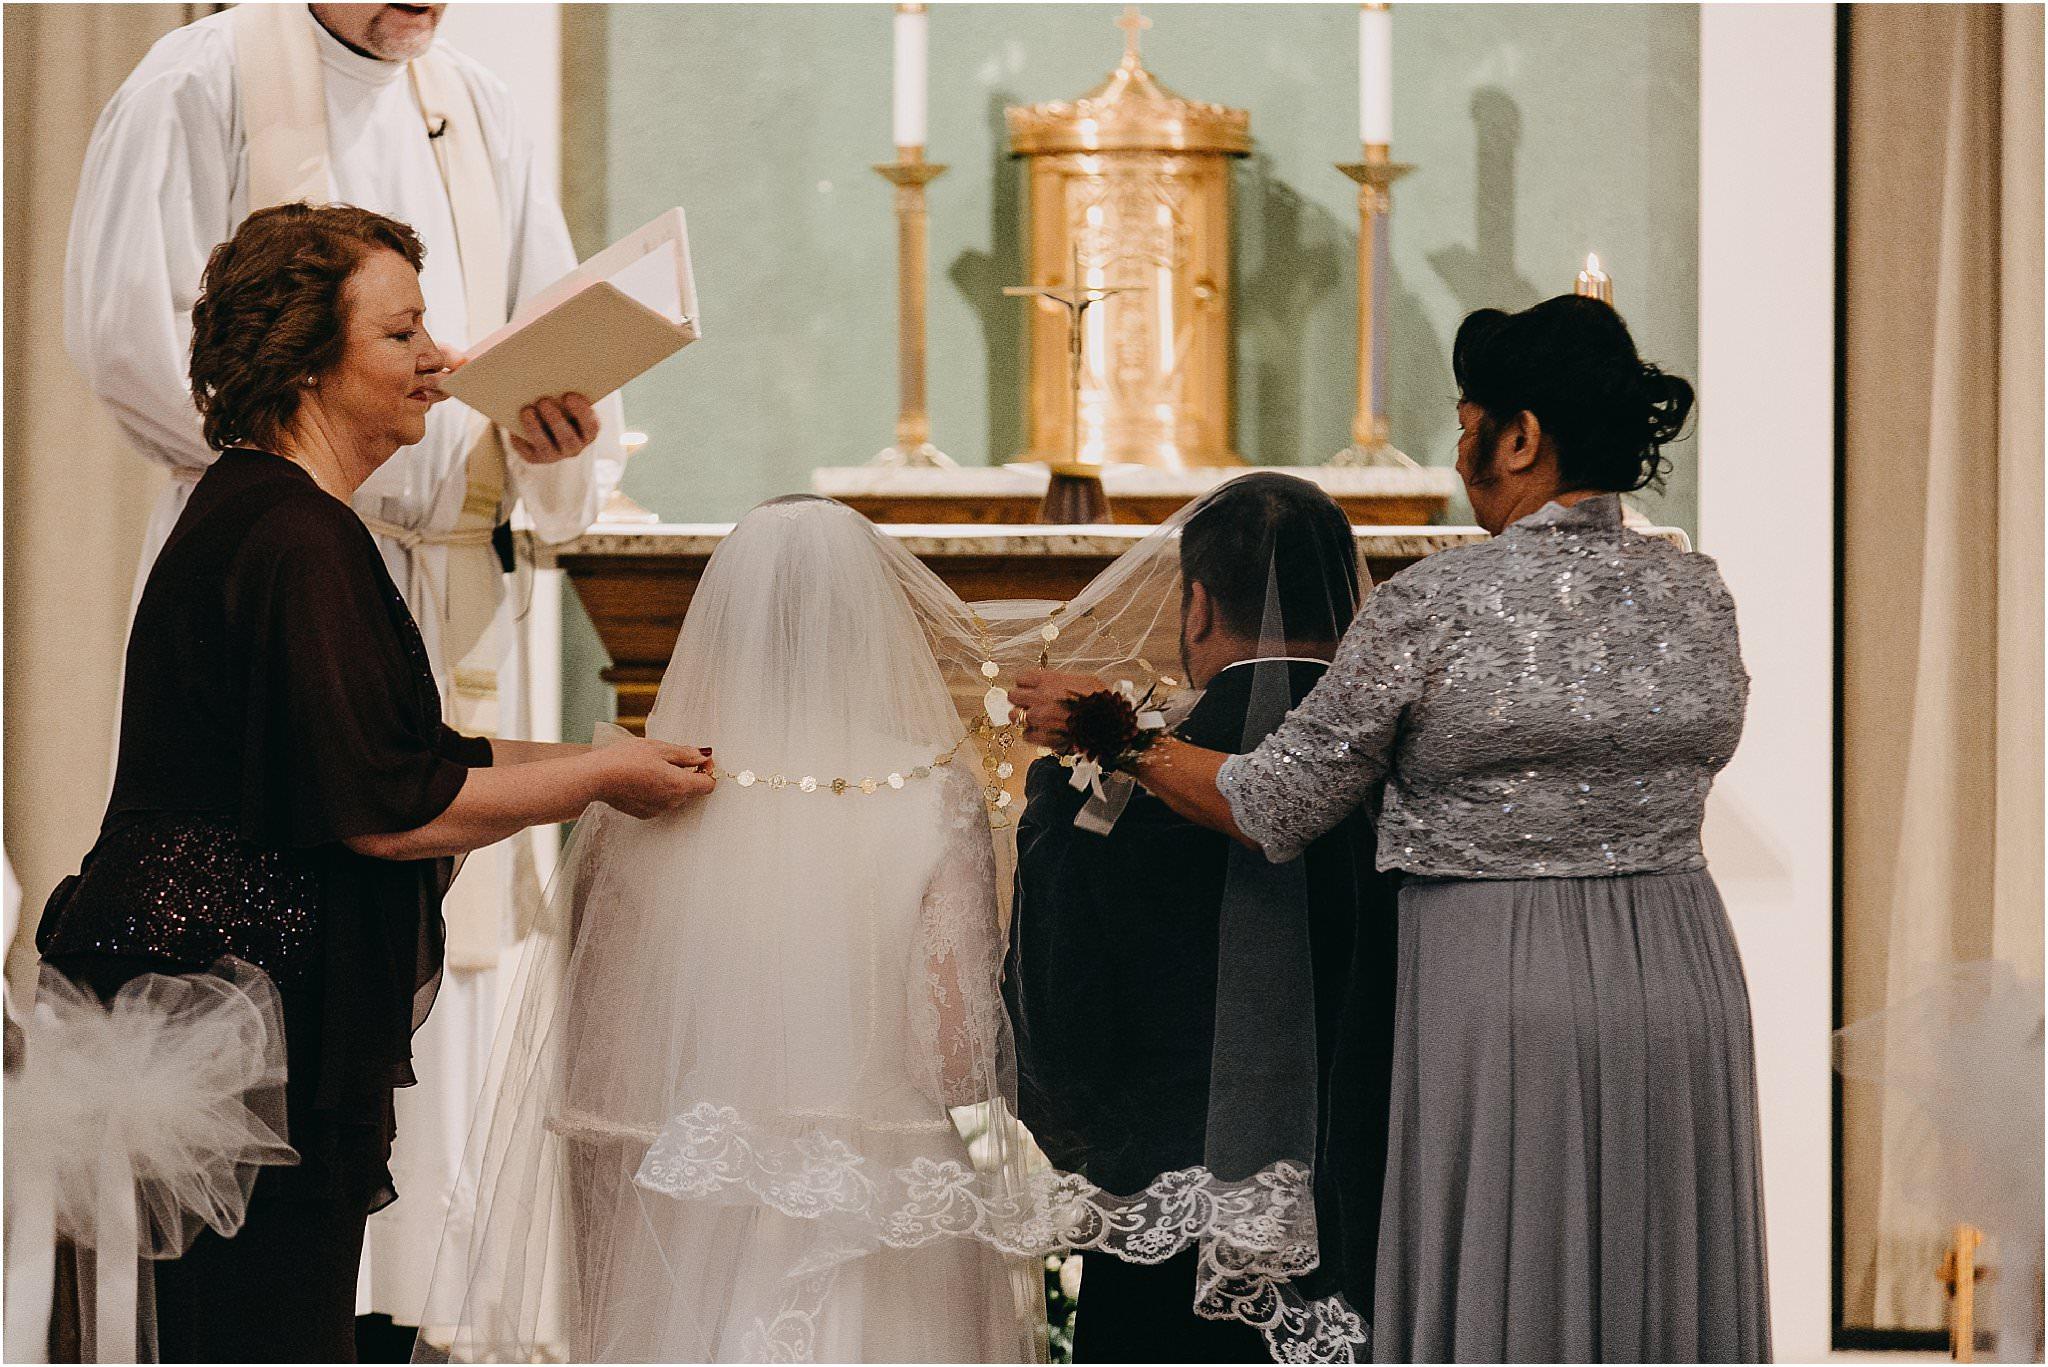 katy-robin-married-in-mukilteo-wedding33.jpg